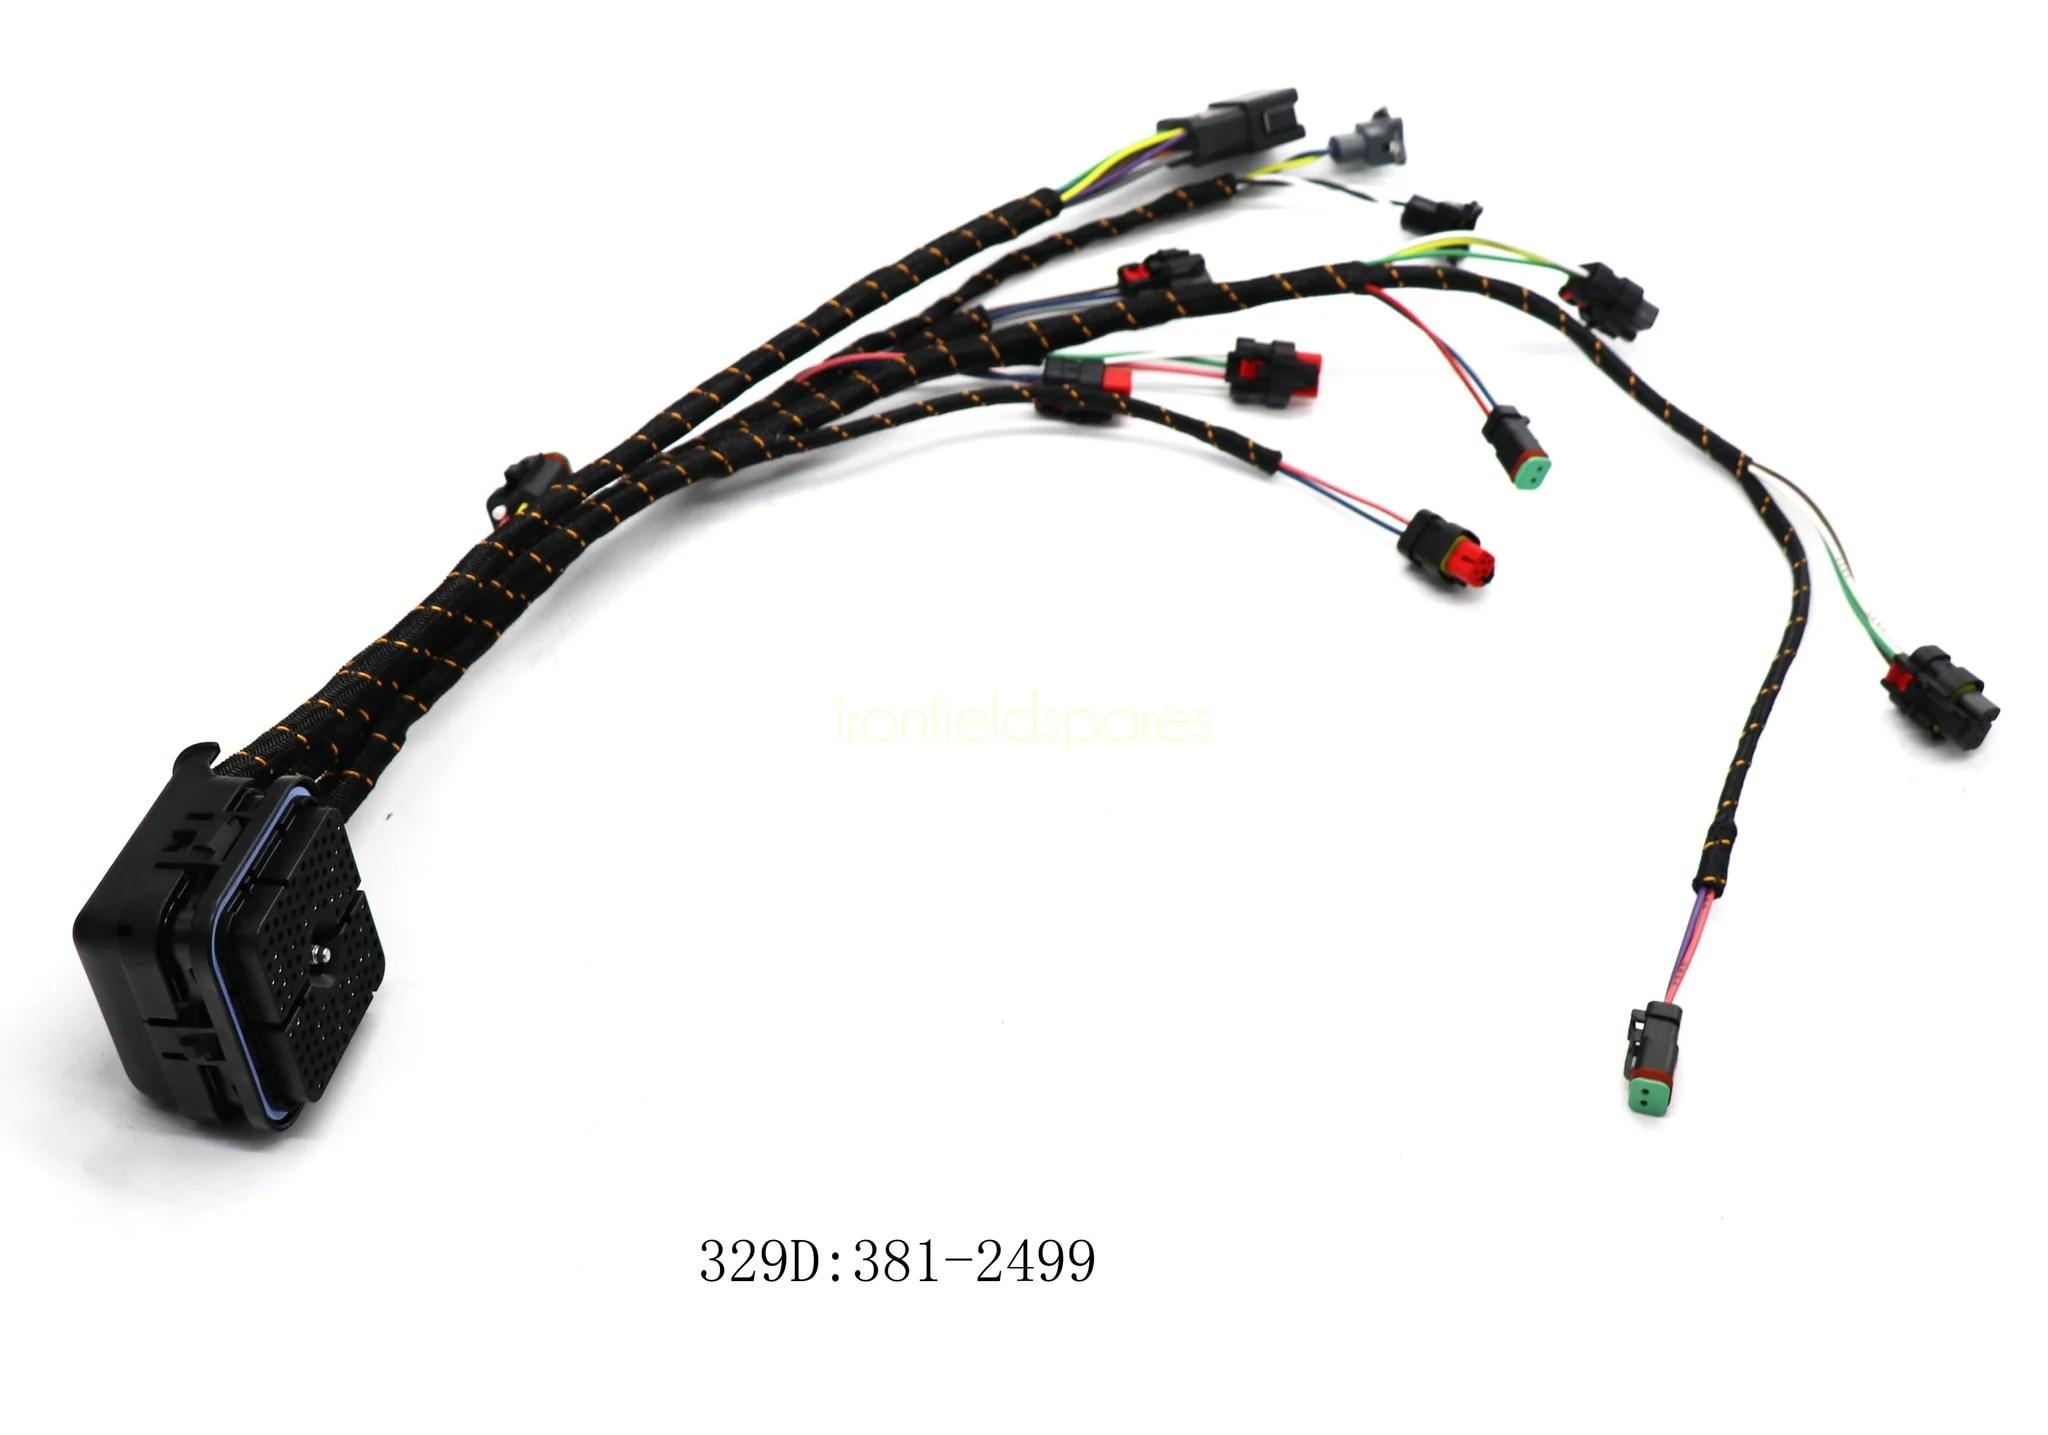 caterpillar equipment wiring harnes [ 2048 x 1435 Pixel ]